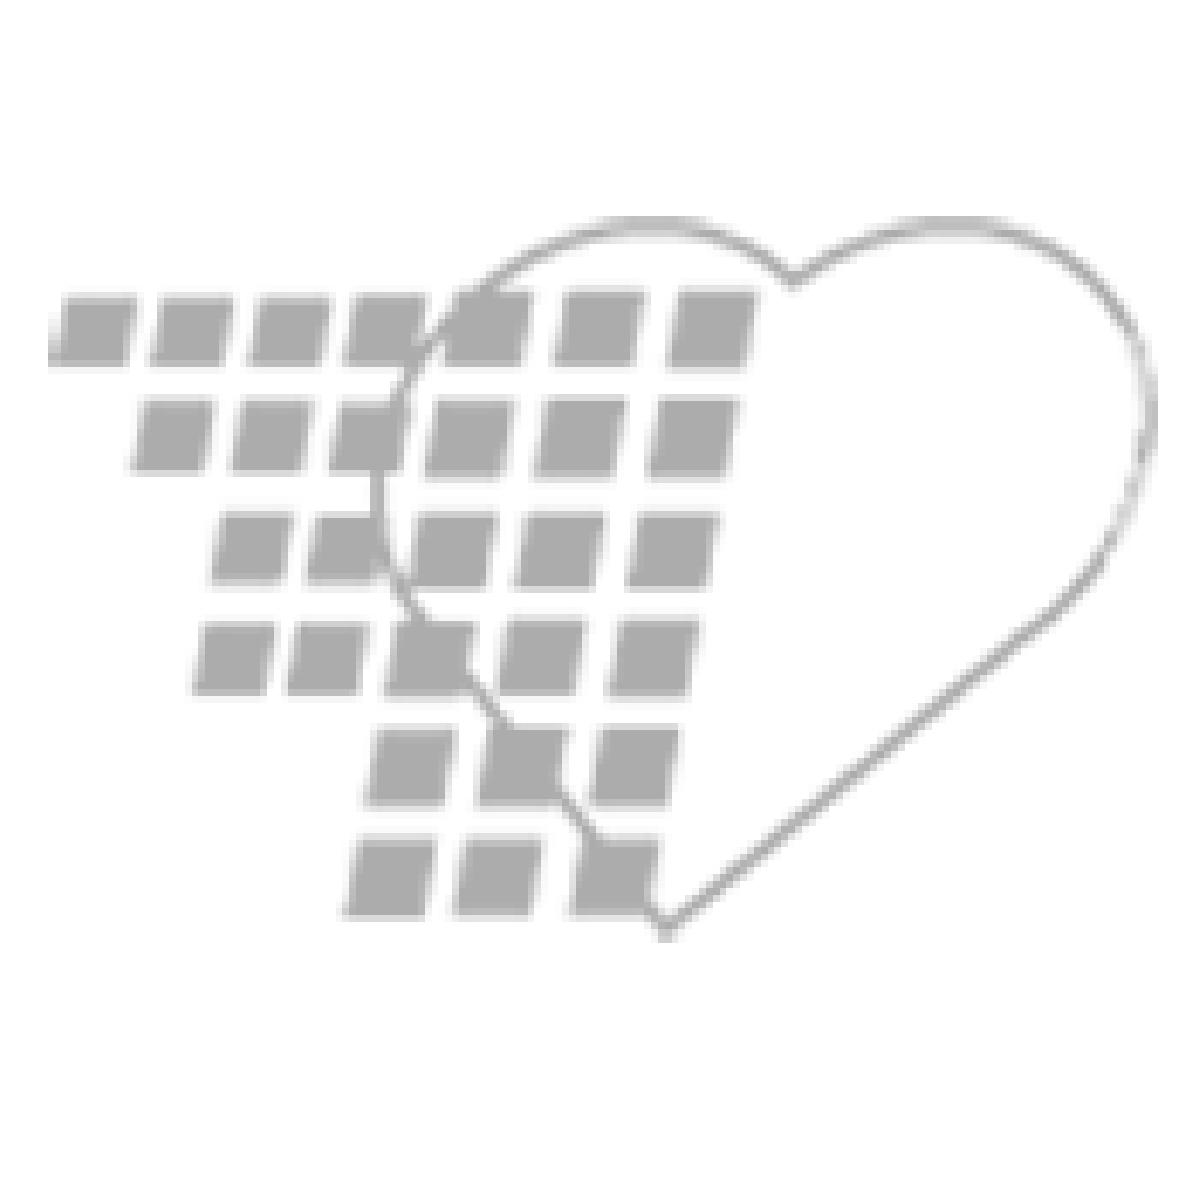 06-54-3100 Pocket Nurse® CV Catheter Each Single Lumen  Non-sterile